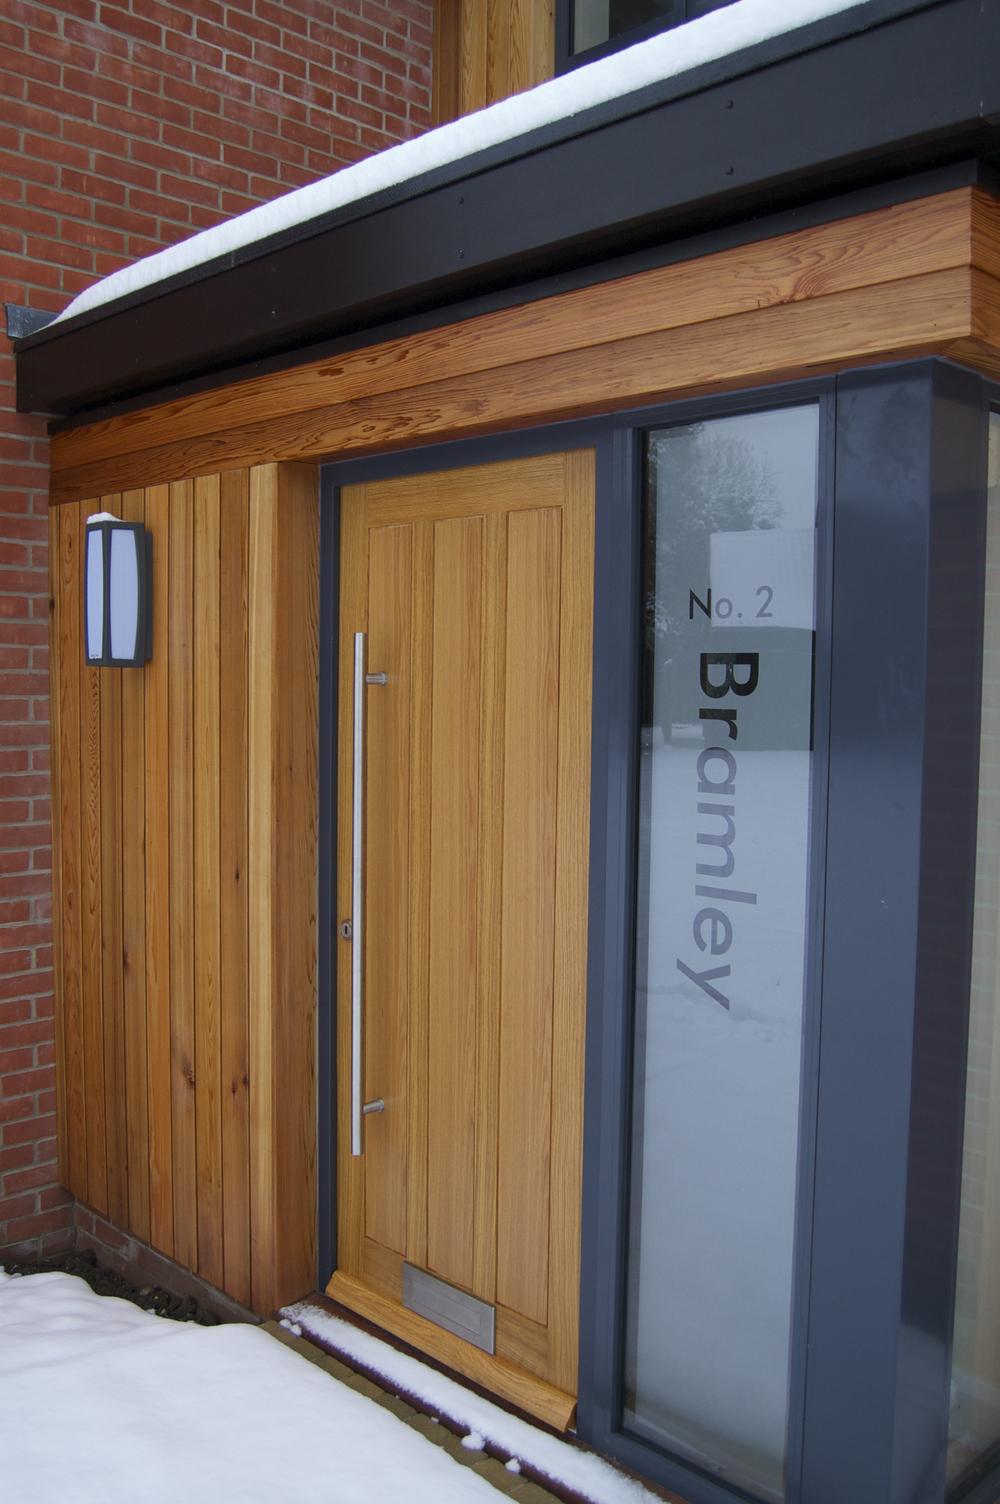 Address: Bell Barn Lane, Kesgrave     Client: Private Client     Structural Engineer: G C Robertson & Associates Ltd     Main Contractor: Christchurch Construction Ltd